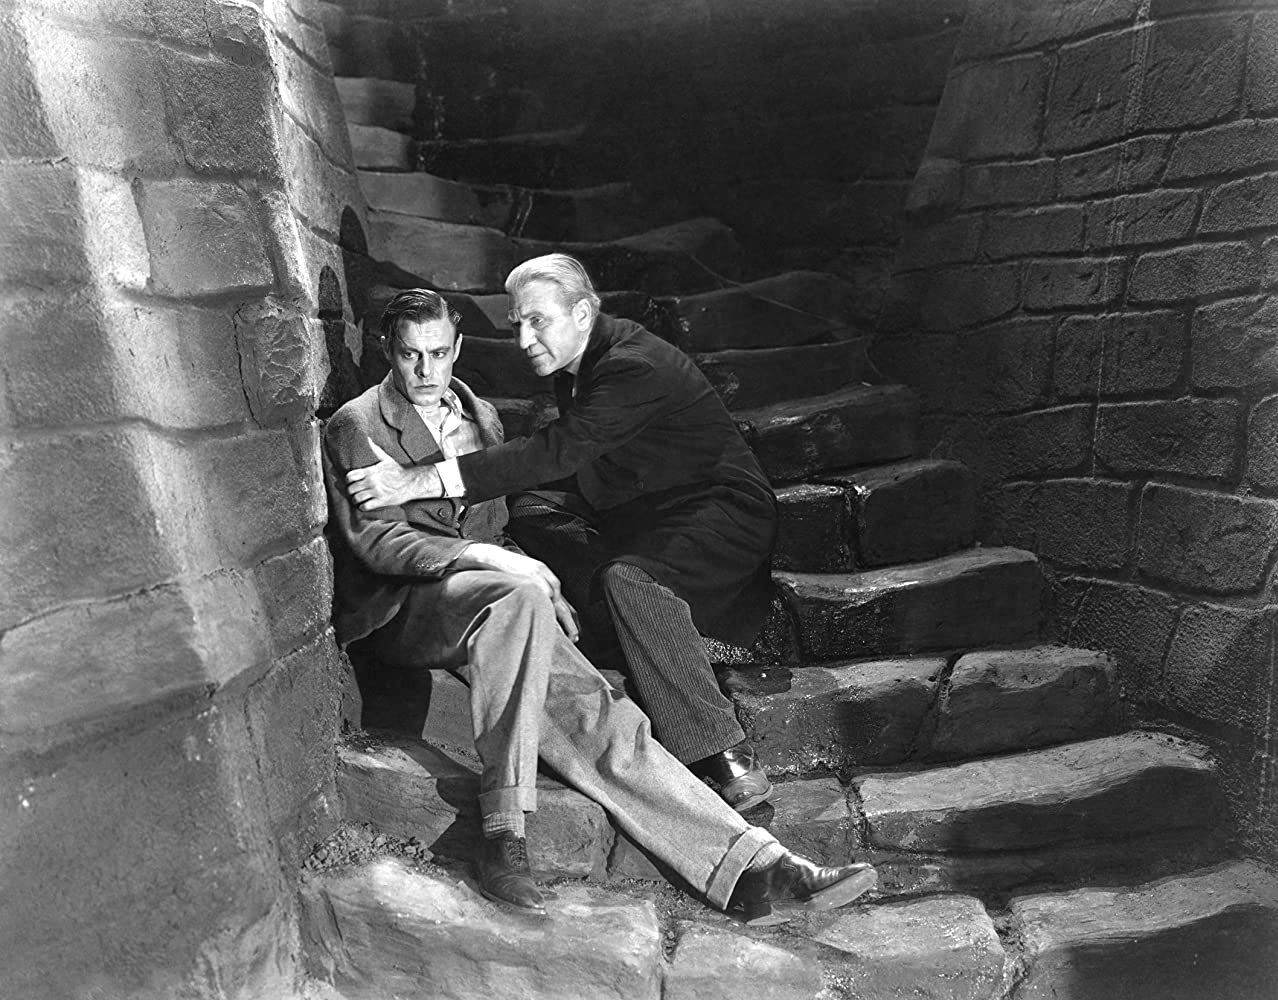 Colin Clive and Edward Van Sloan in Frankenstein (1931)